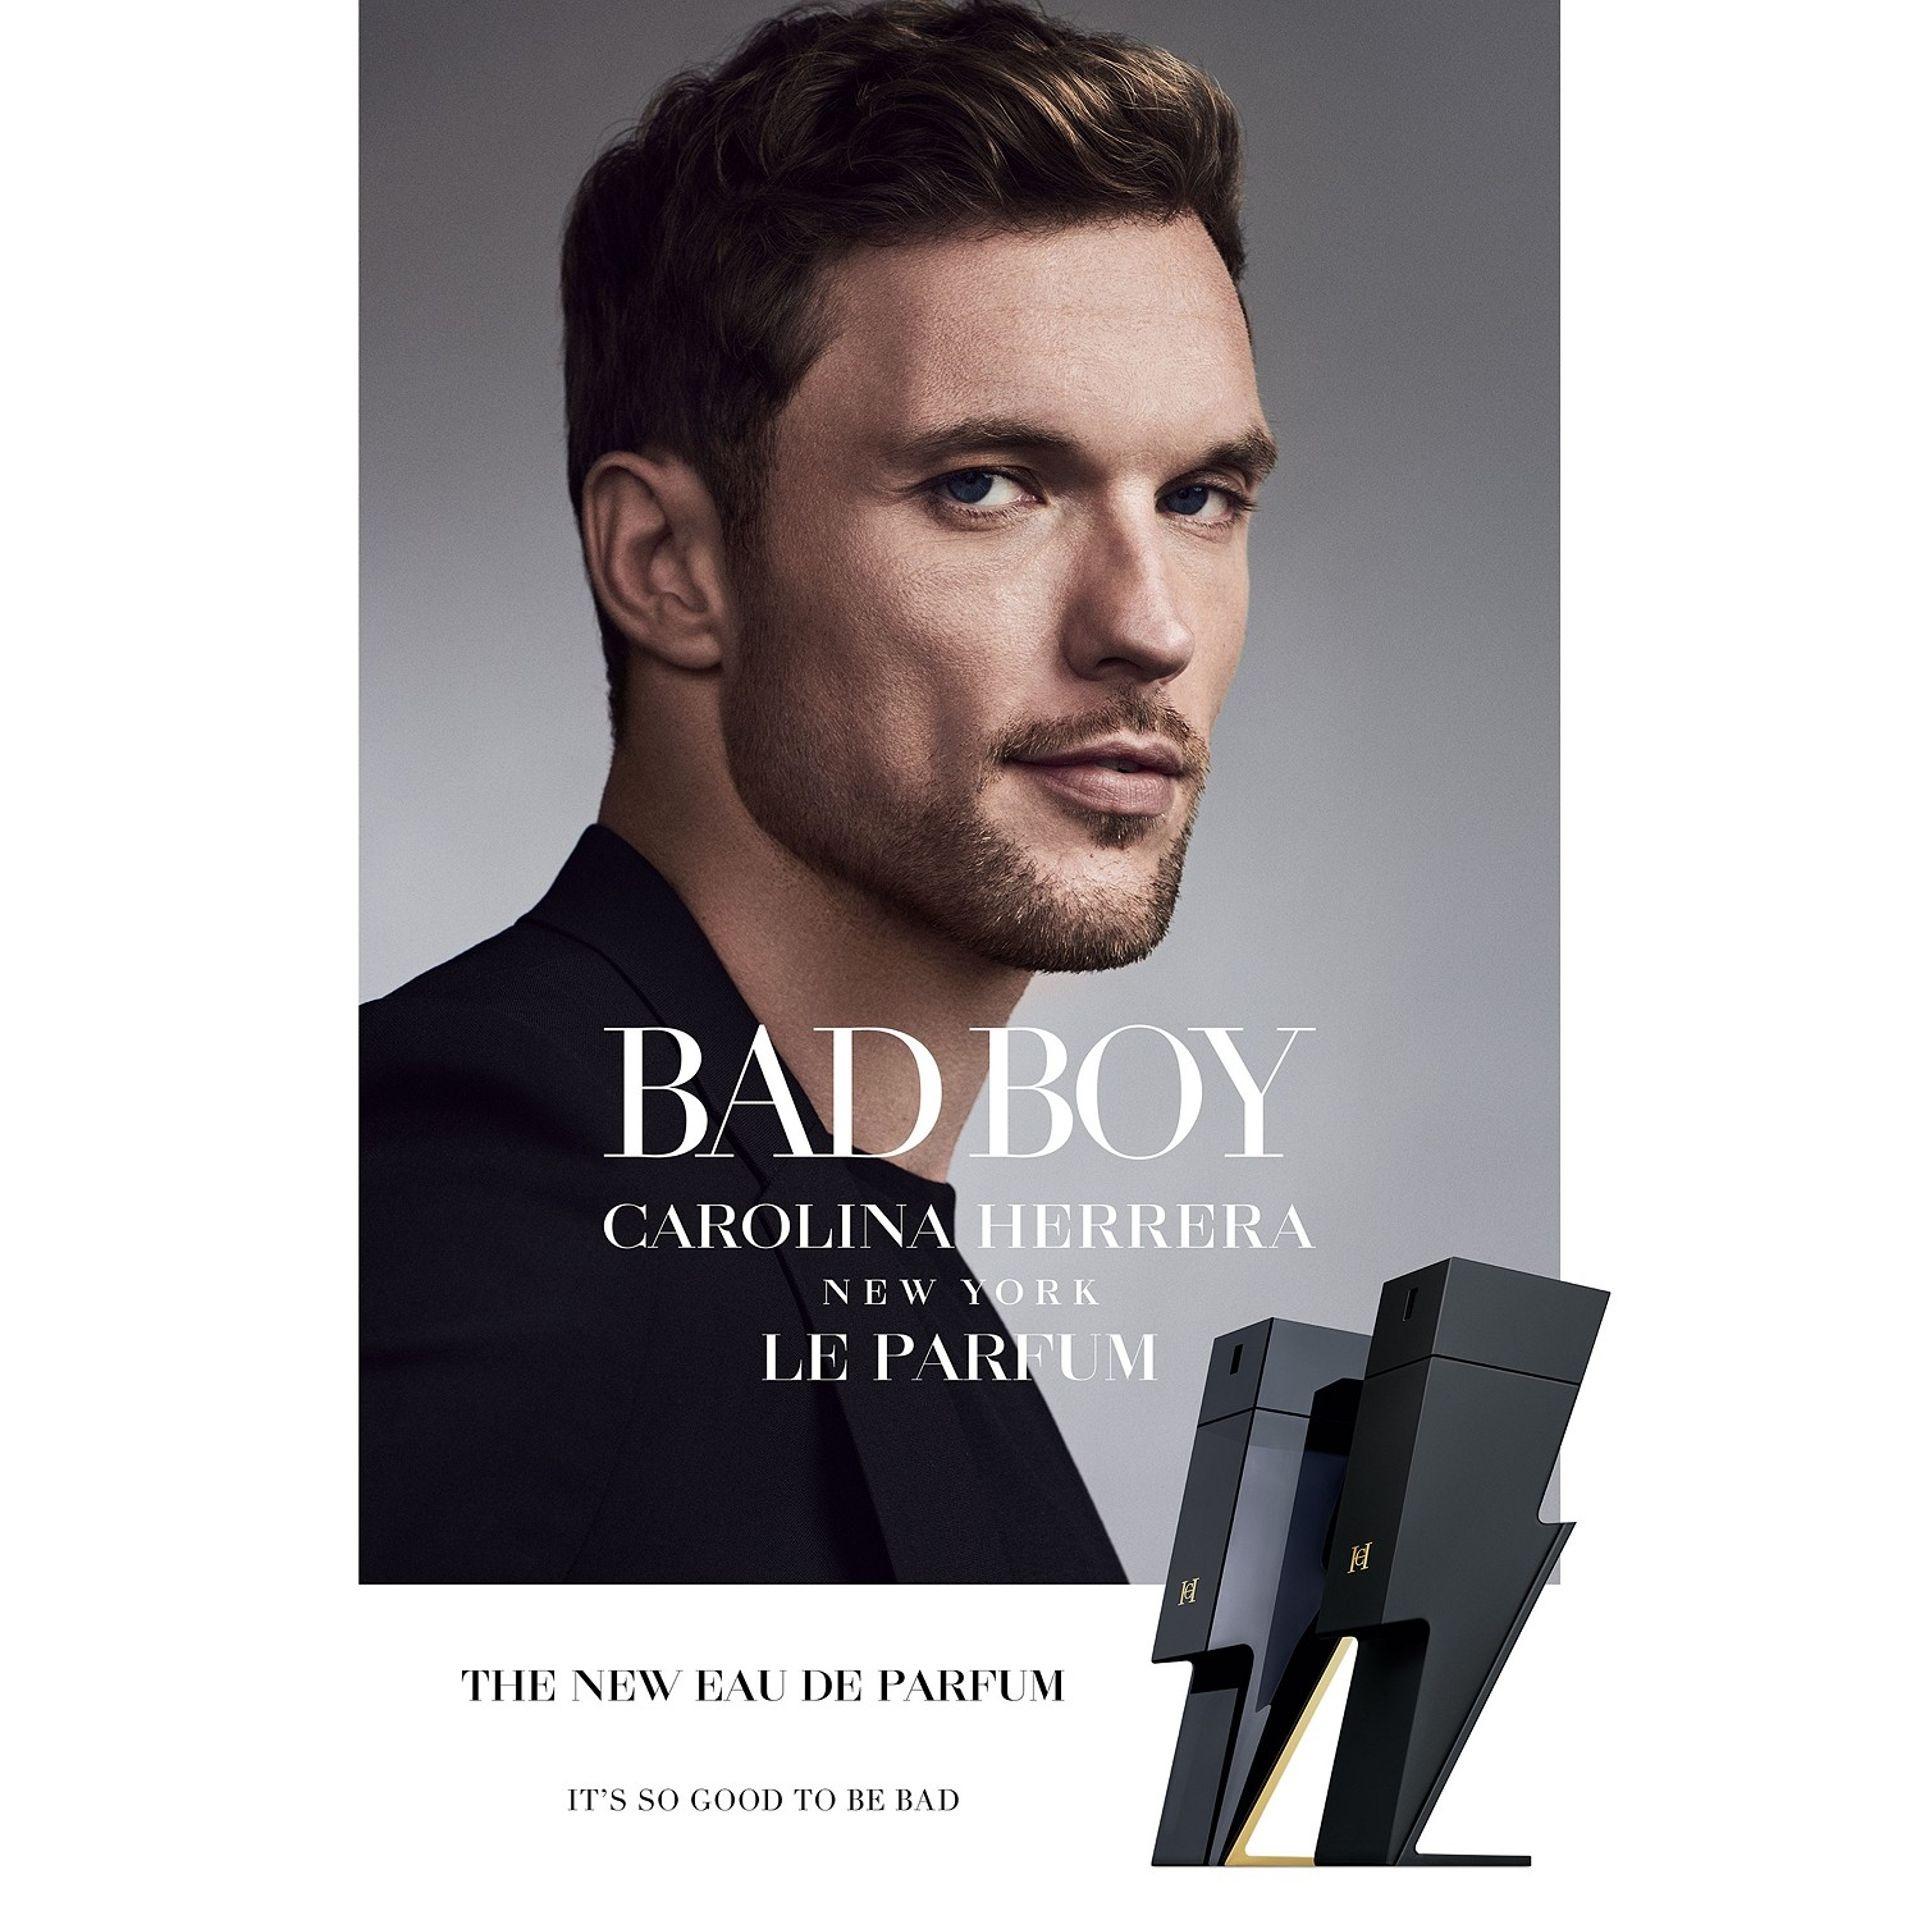 Carolina Herrera Bad Boy Le Parfum opinie